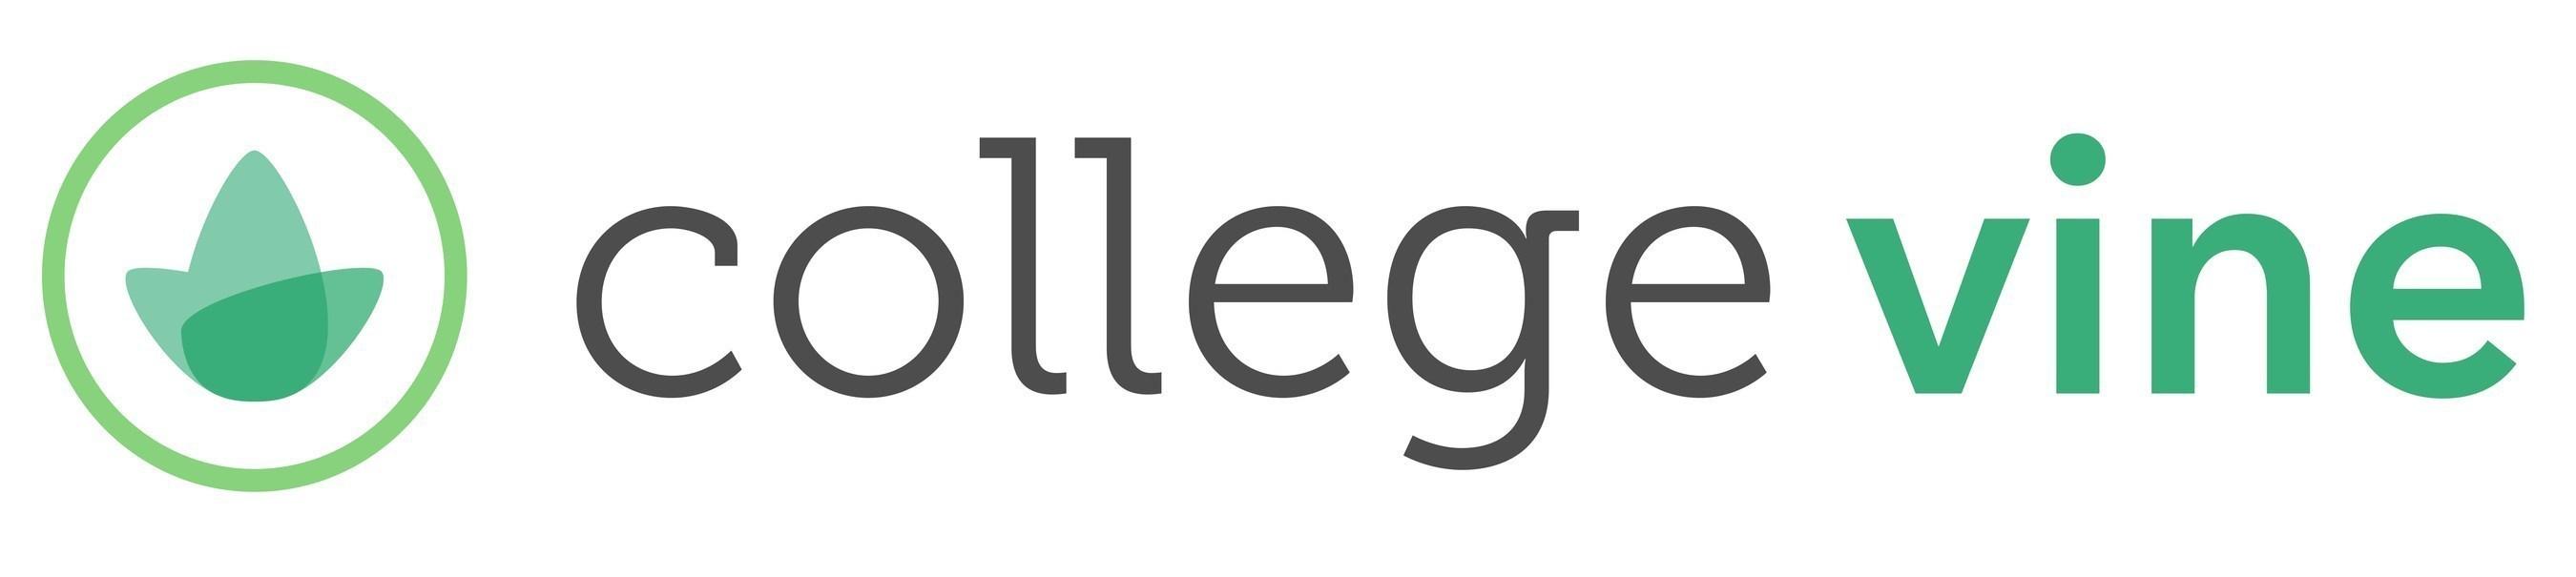 CollegeVine logo